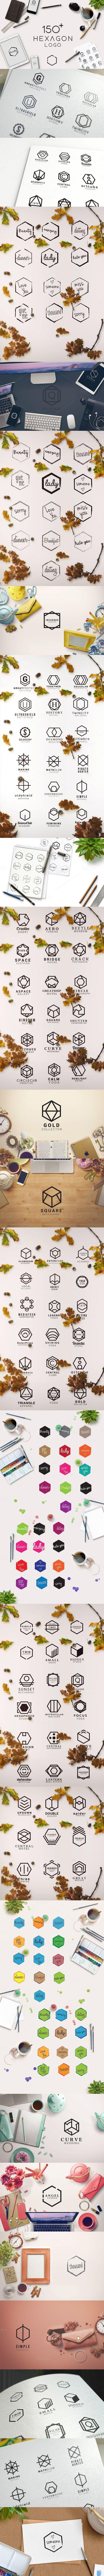 150+ Minimal Hexagon Logo Templates. Logo Templates. $25.00